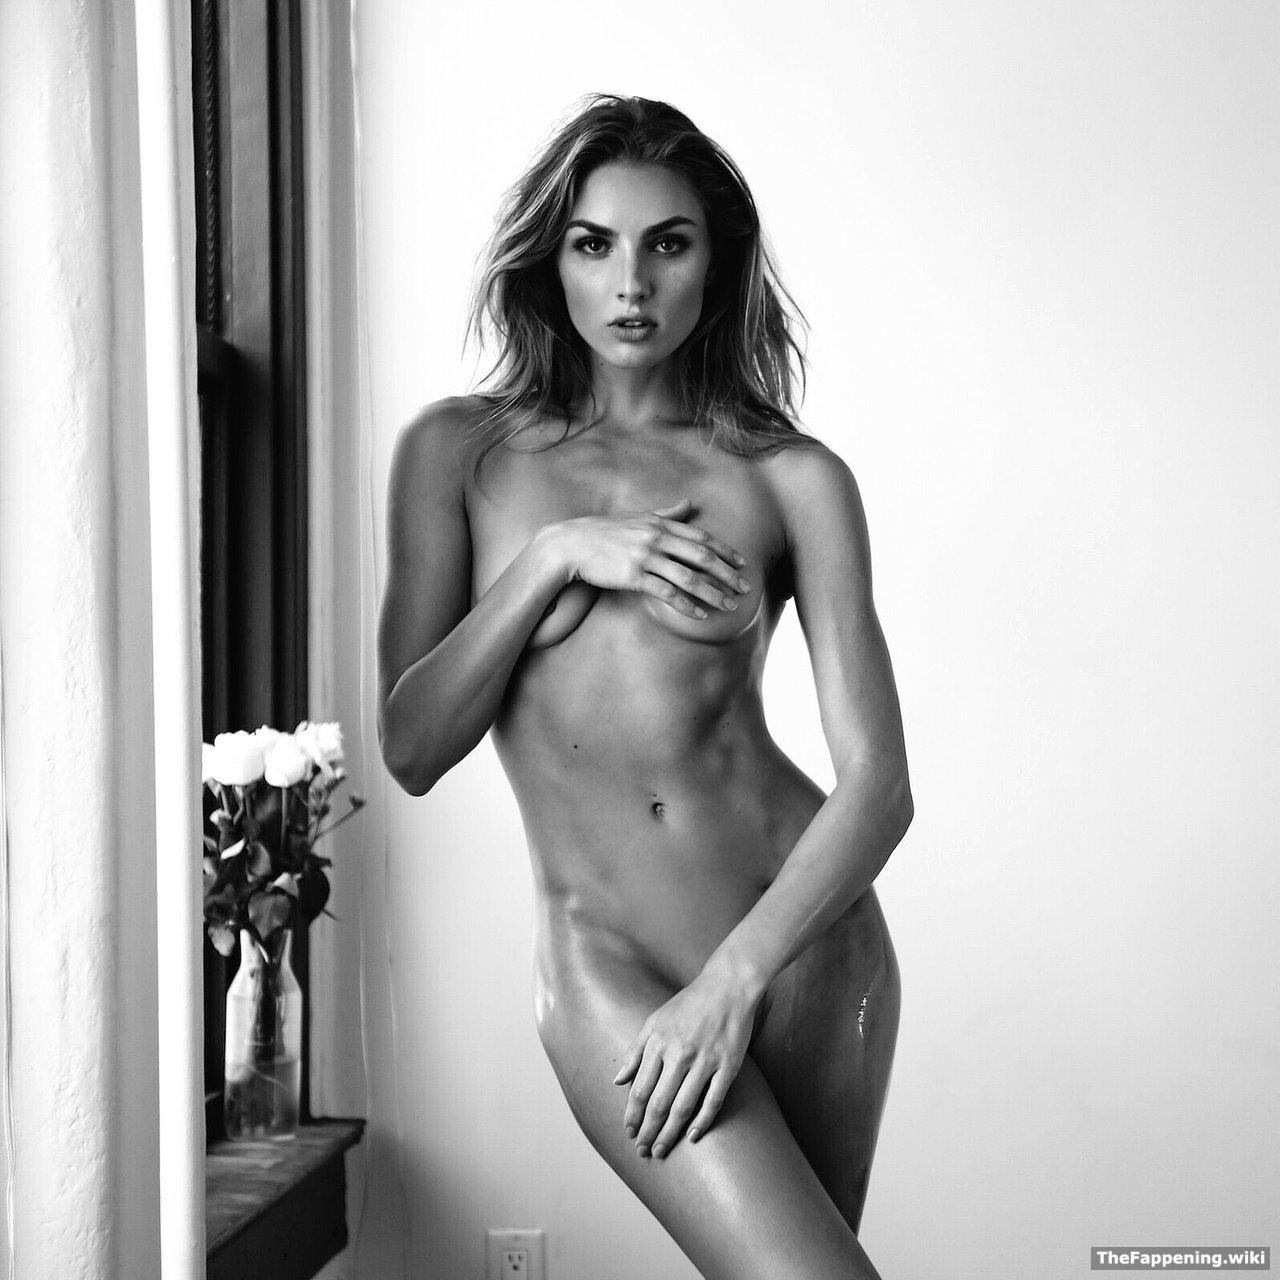 Porno Mackenzie Thoma nudes (12 photo), Tits, Hot, Feet, see through 2006